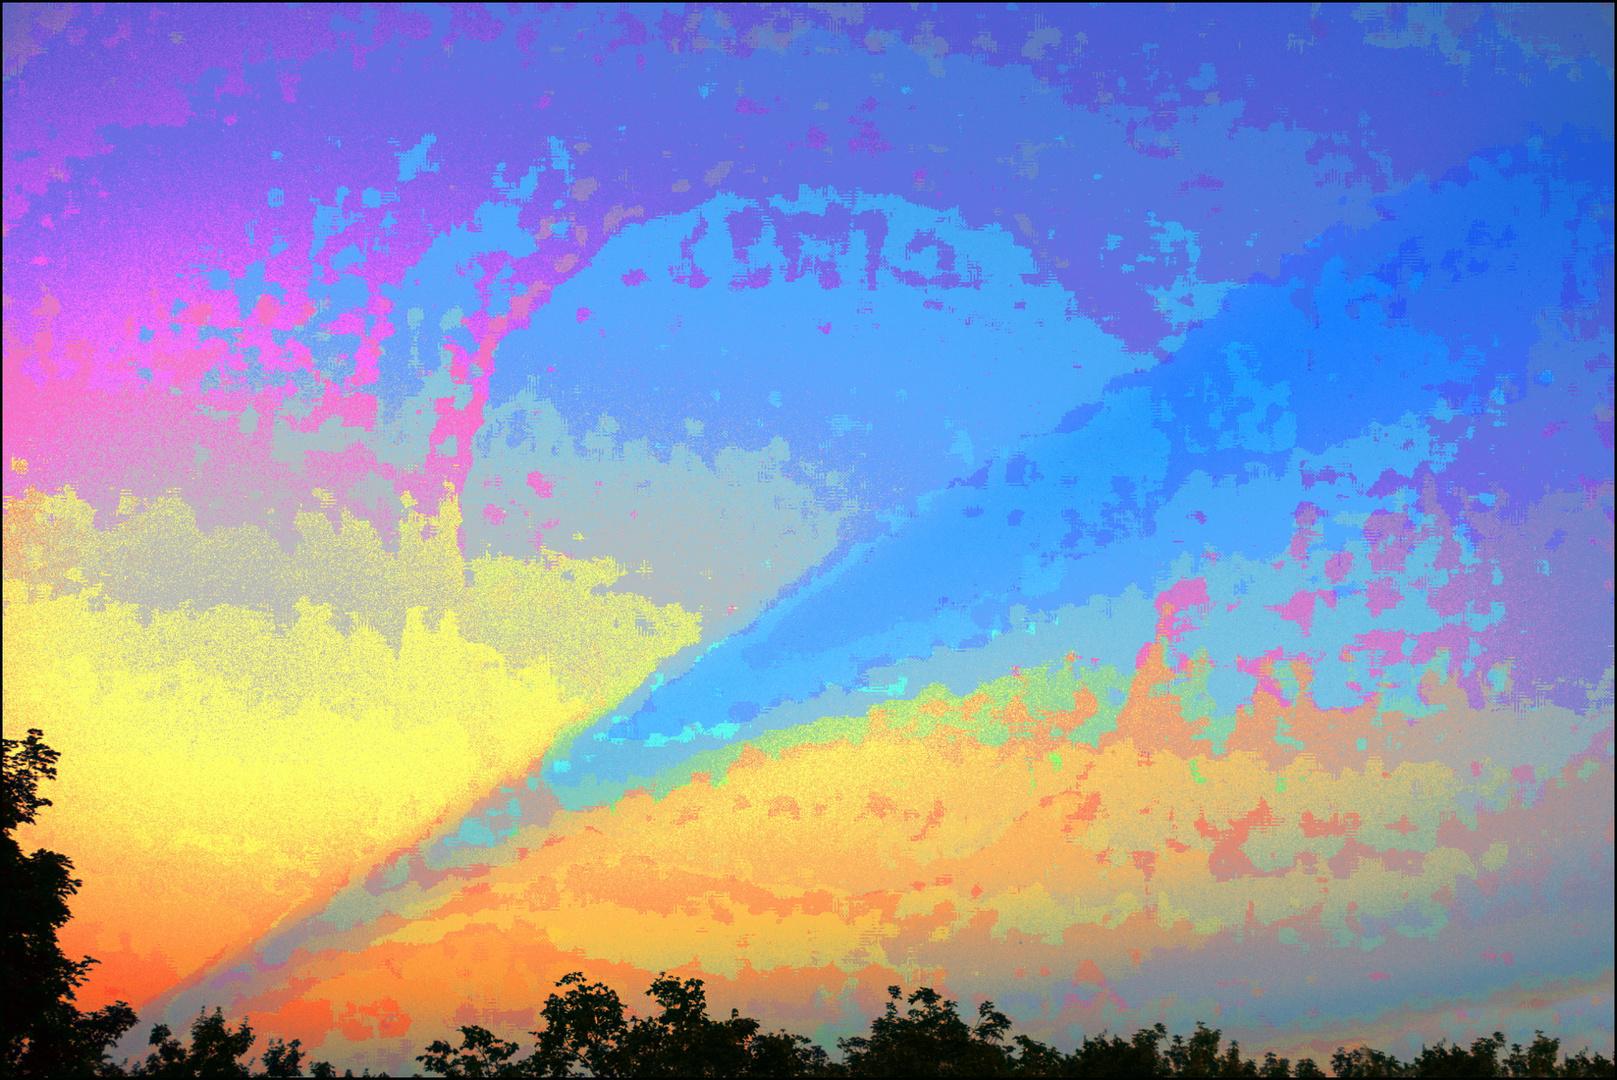 art-istischer Diagonalhorizont